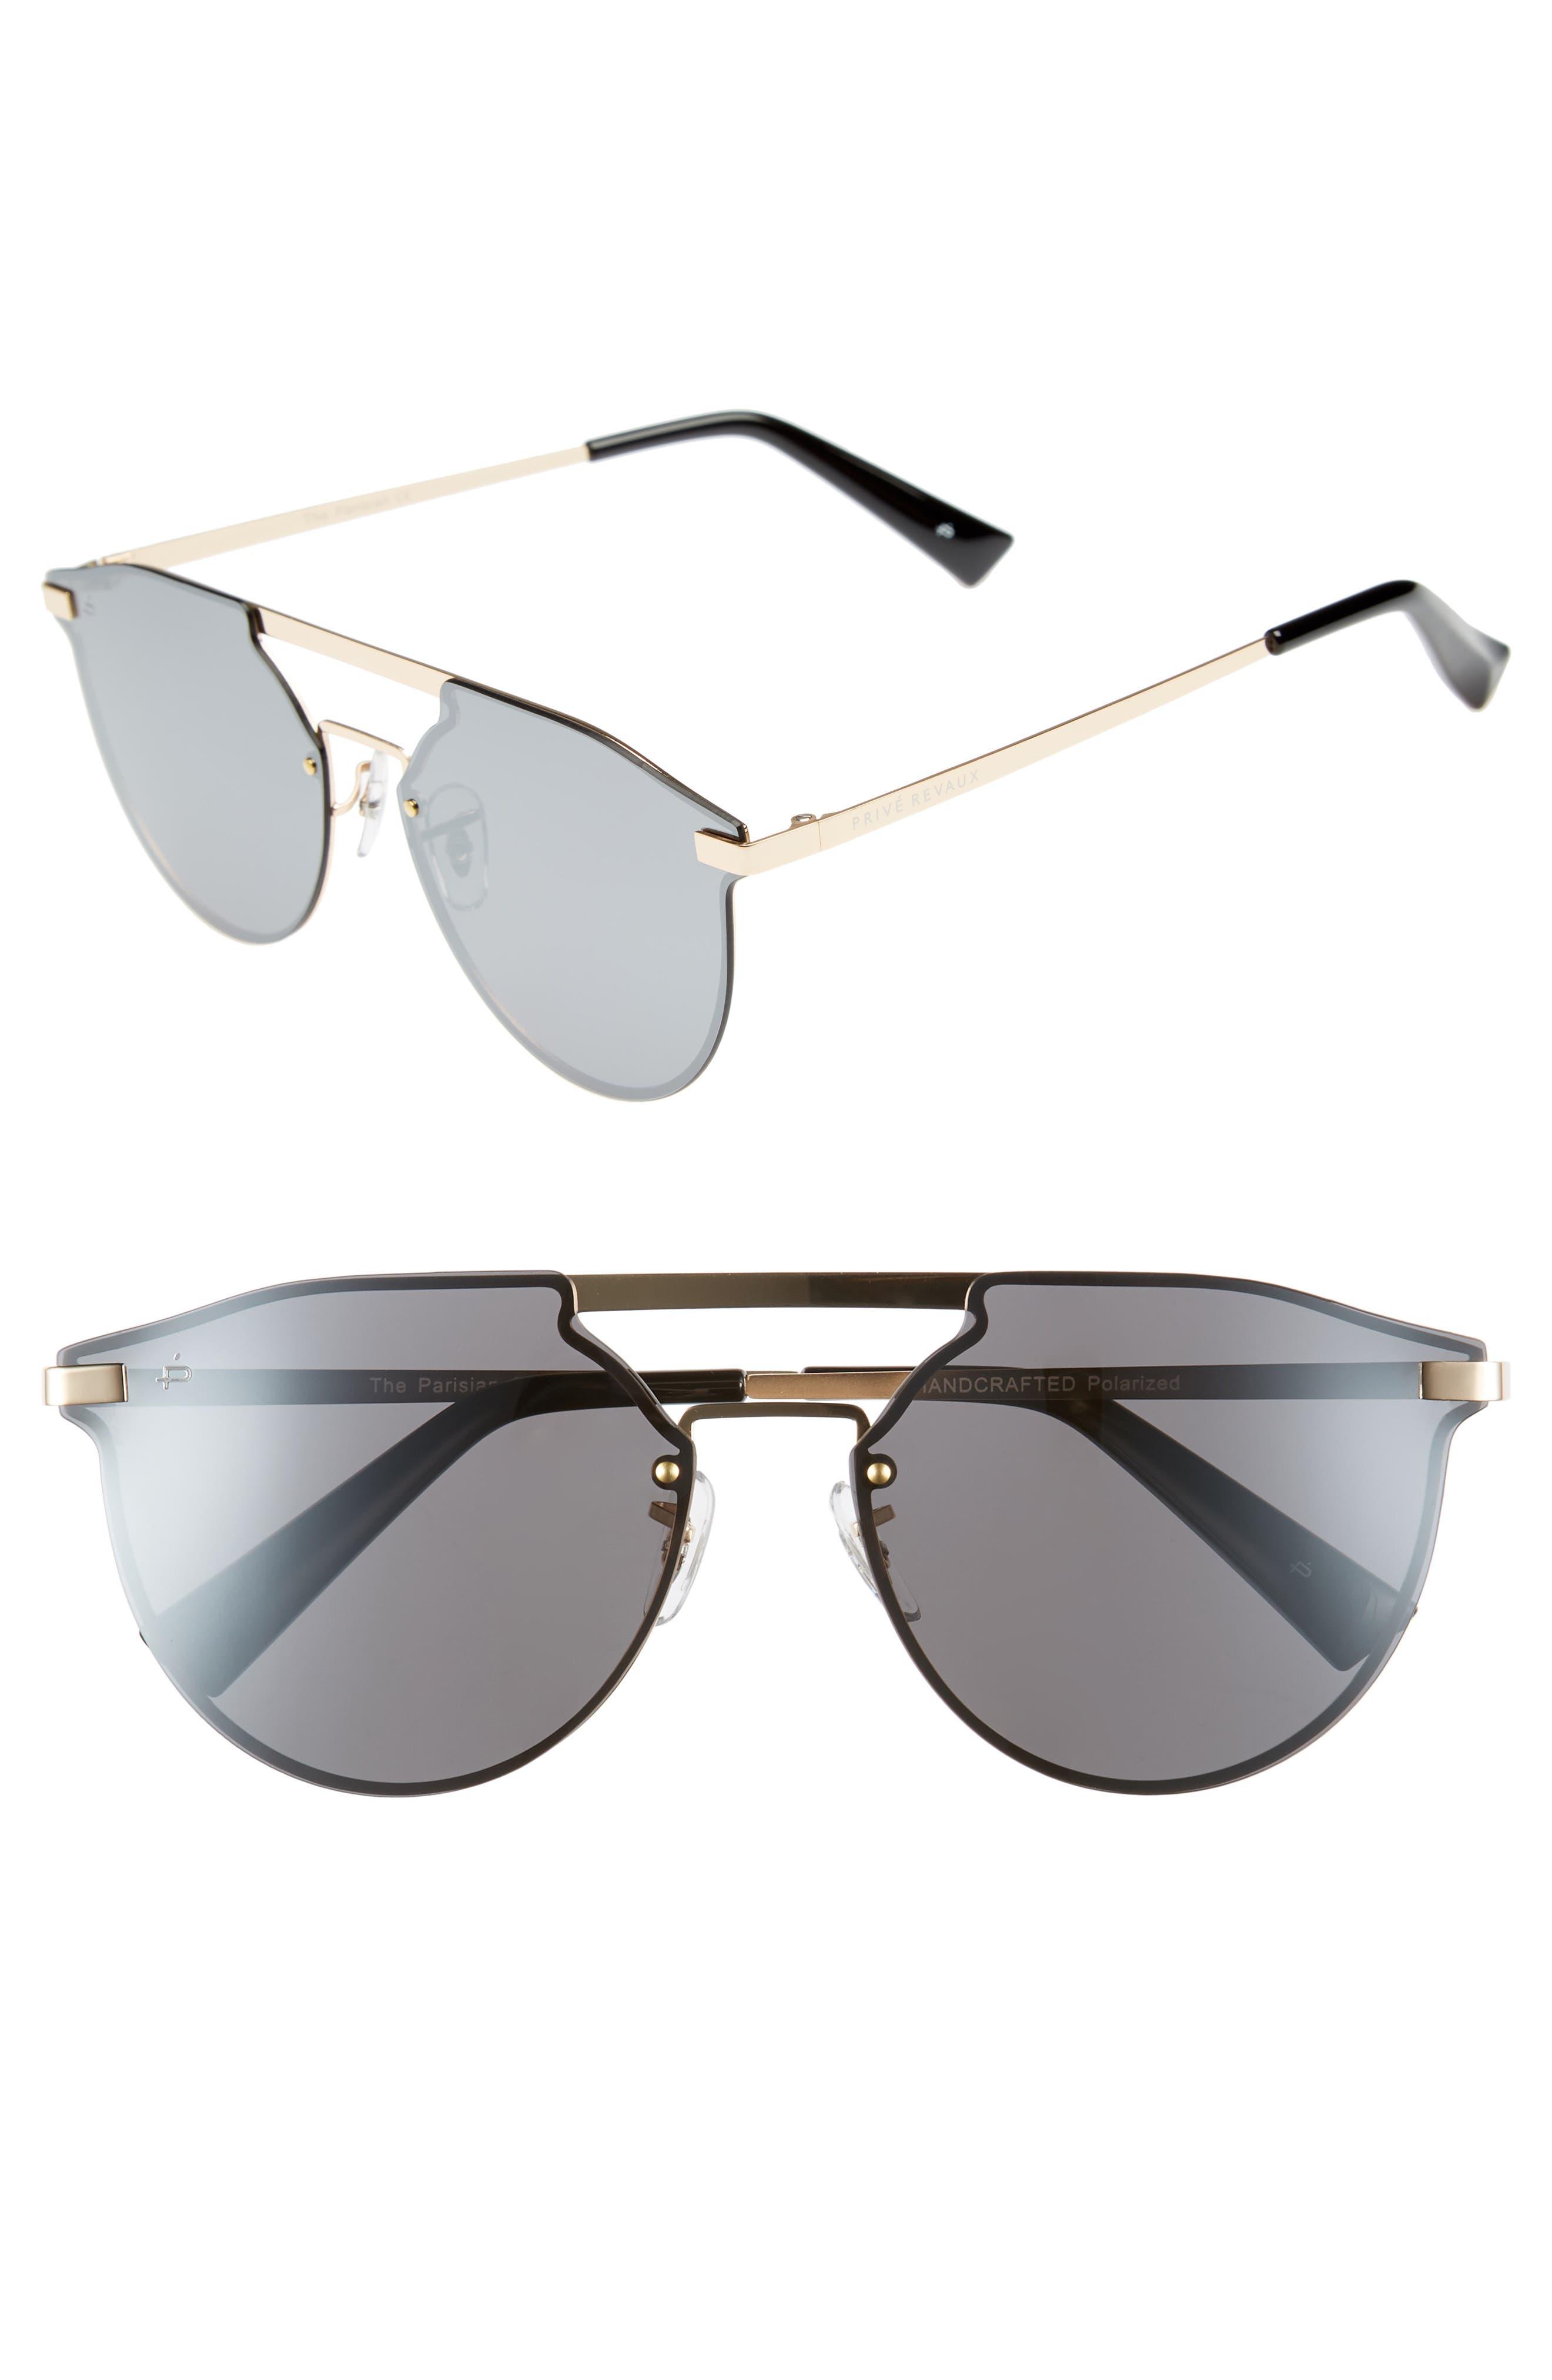 Main Image - Privé Revaux The Parisian 62mm Aviator Sunglasses